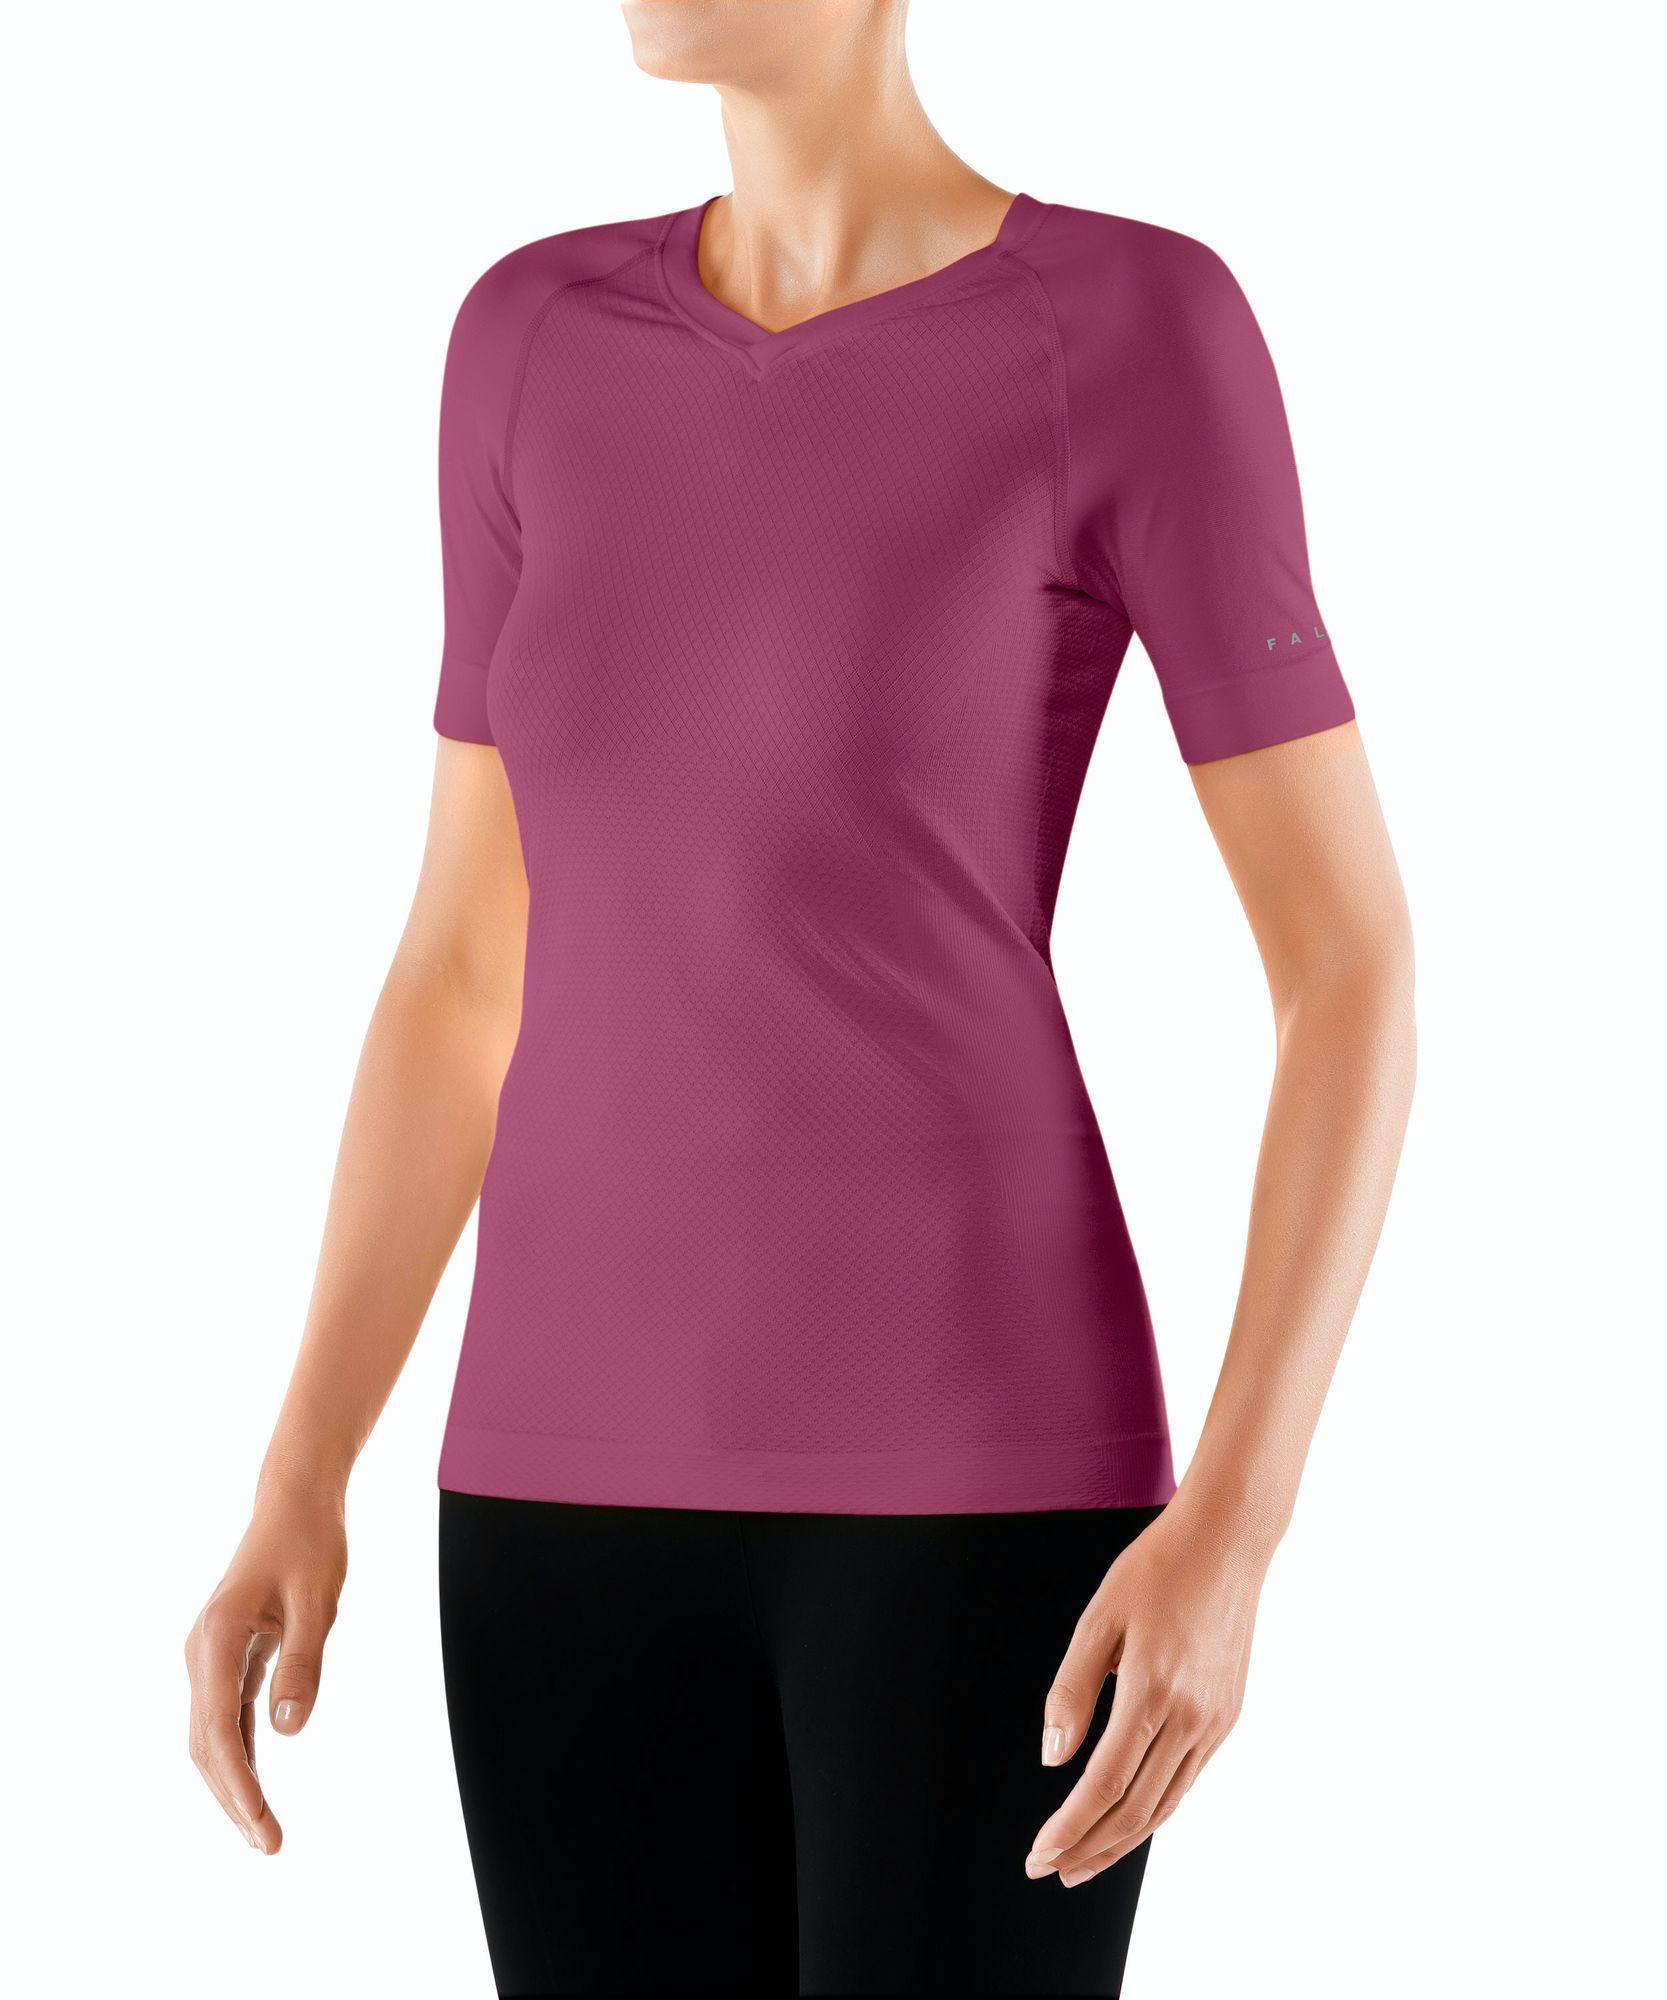 Falke Lady Short Sleeve Shirt Cool (Lila)